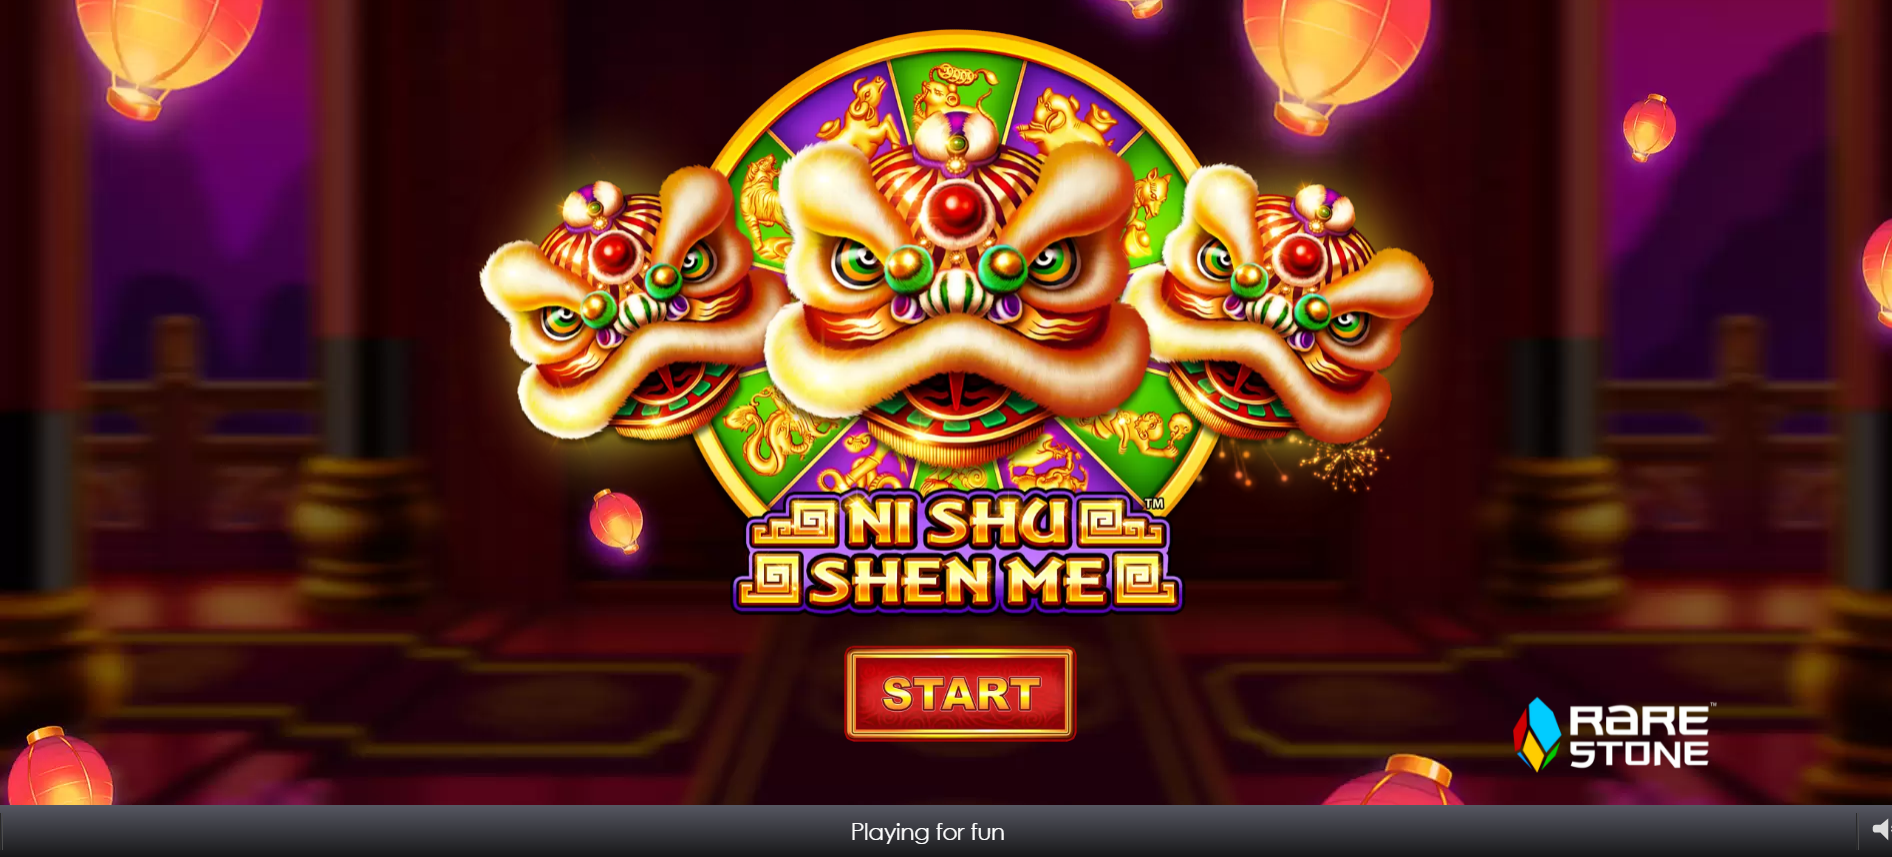 Ni Shu Shen Me Slot Online (1)